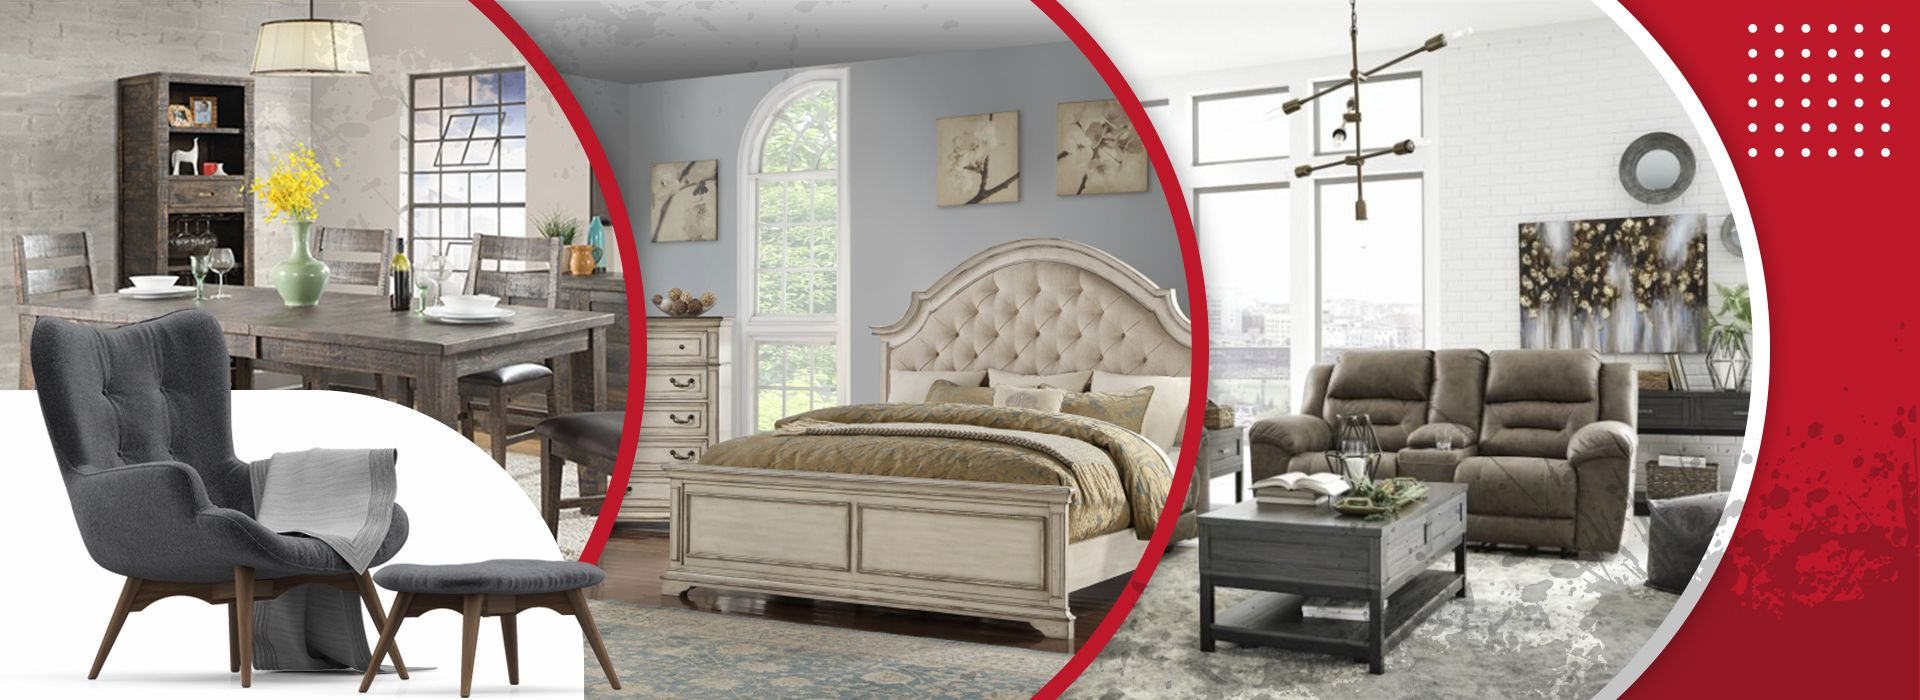 Furniture - Tulare - Hanford - Porterville - Delano - Fresno